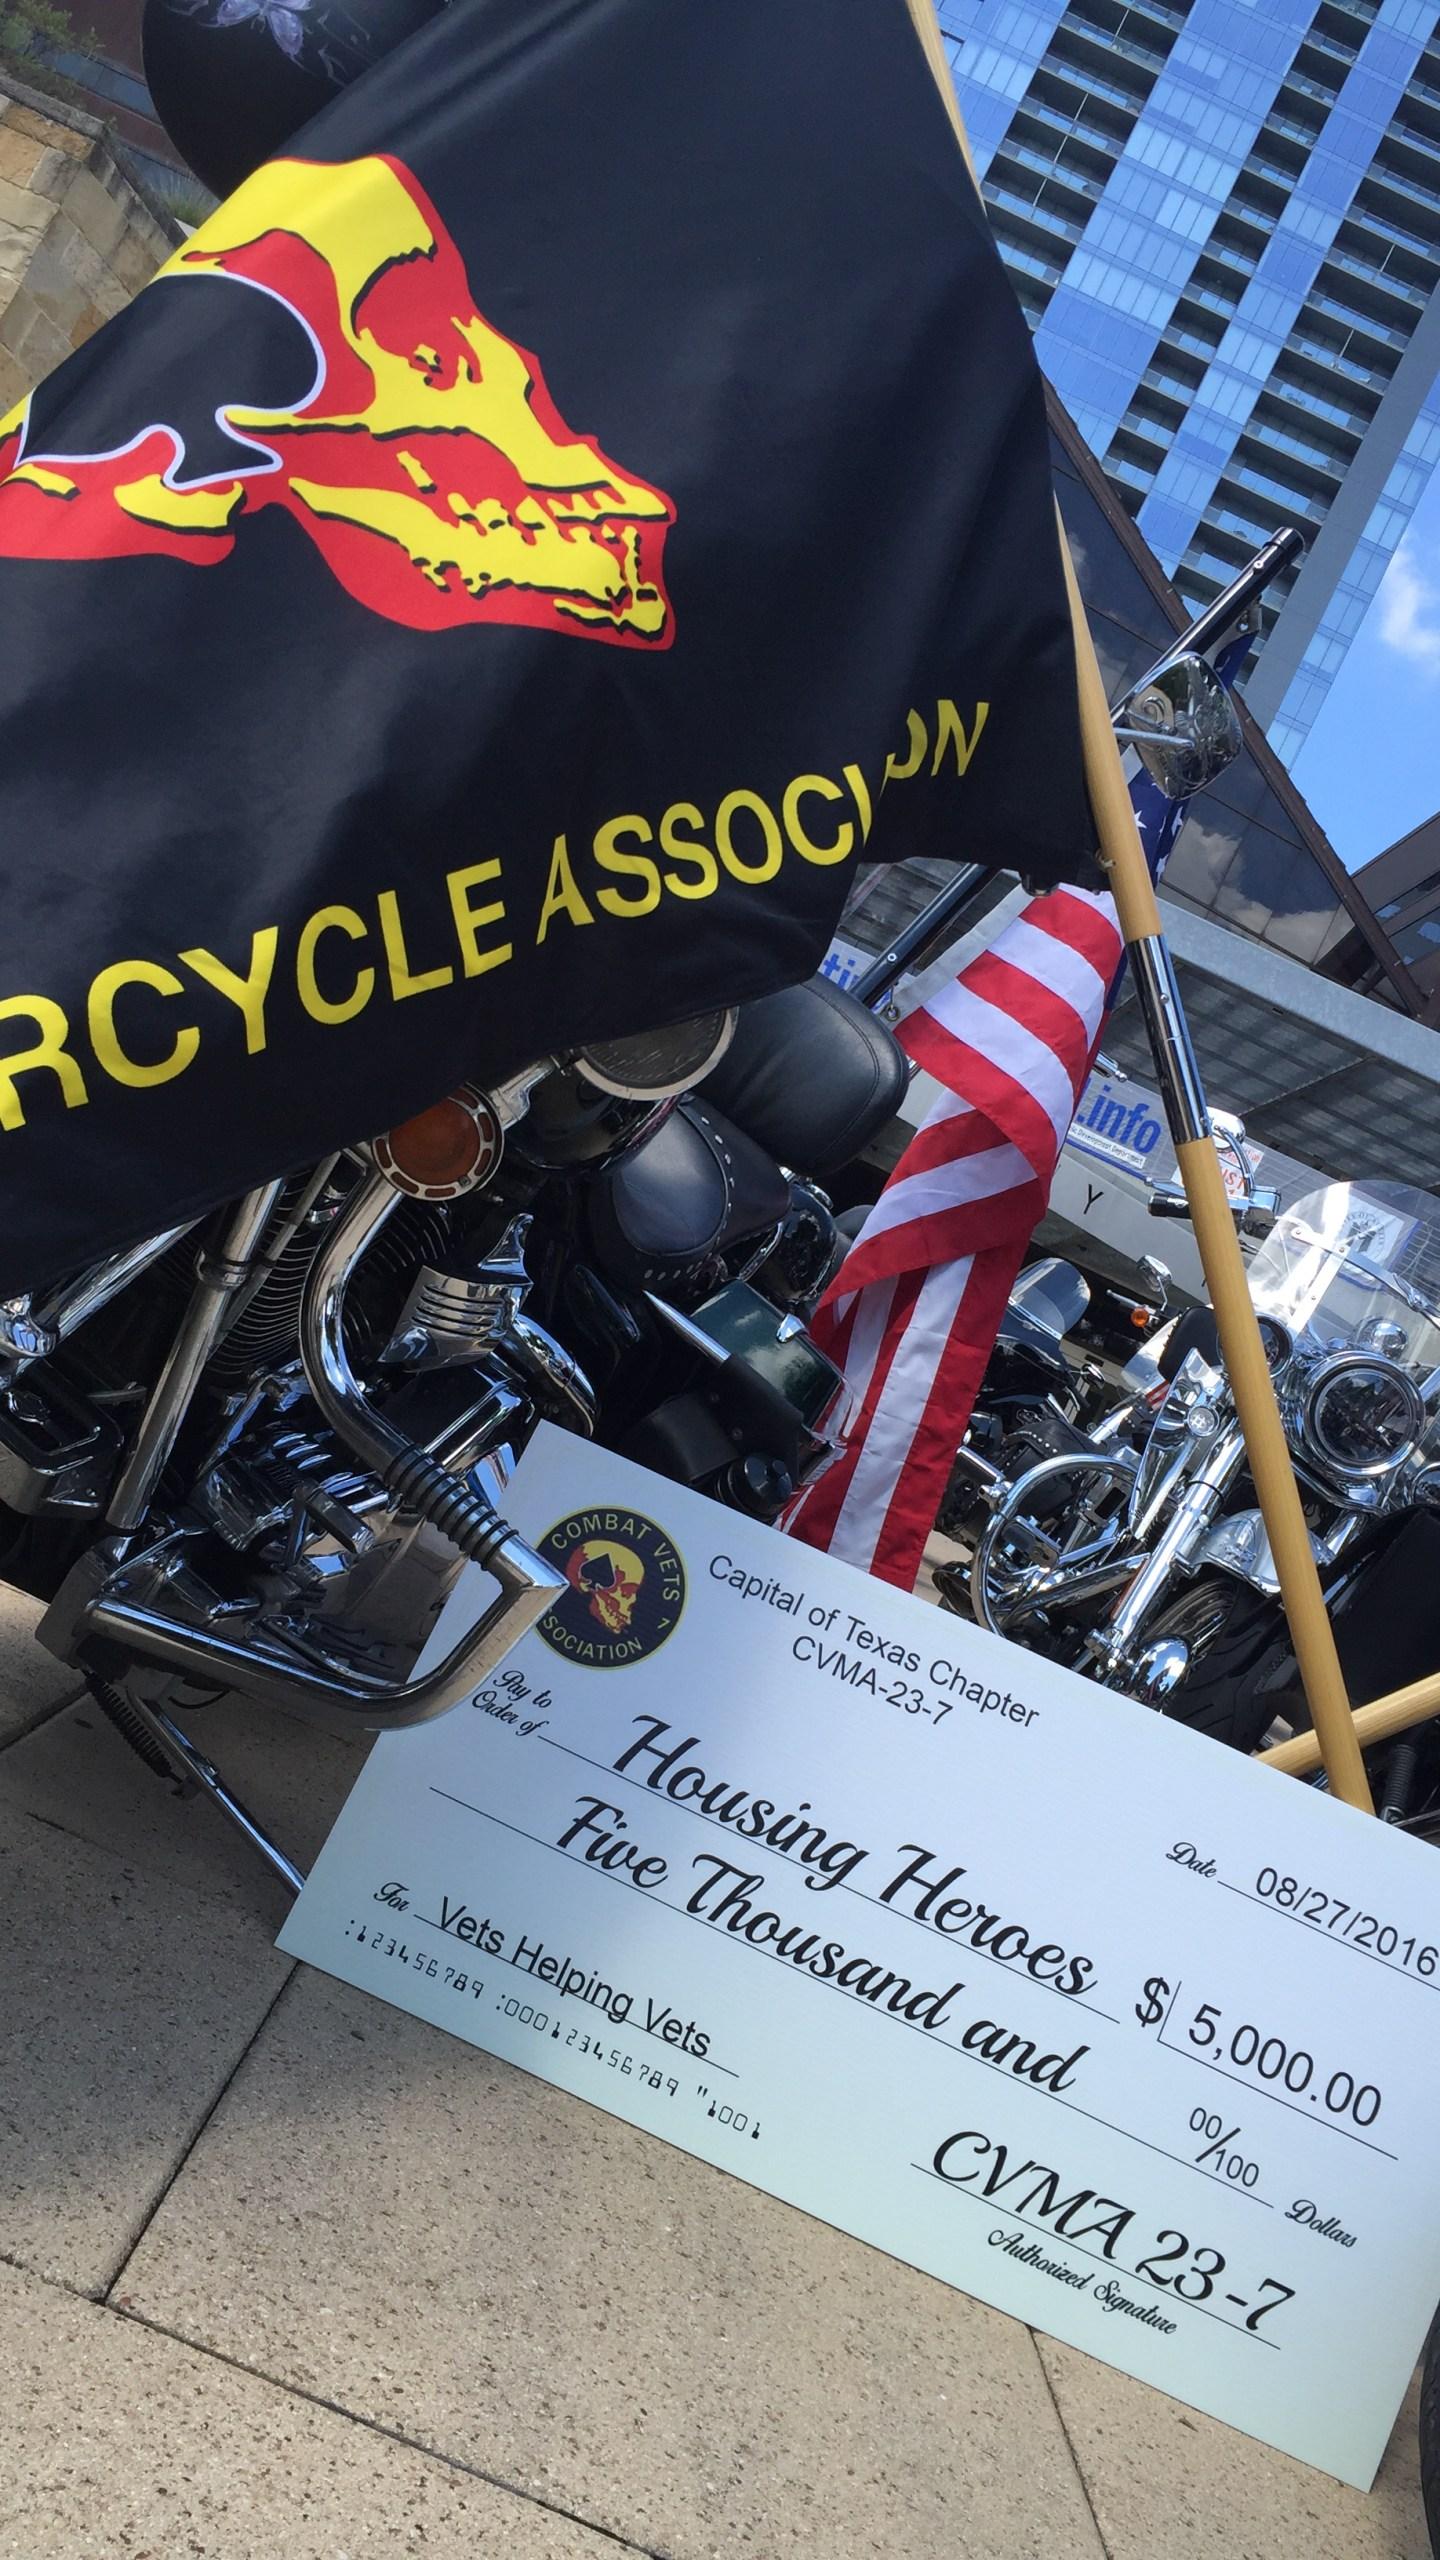 Combat Vets Association present $5,000 donation to Mayor Adler August 27, 2016._340360